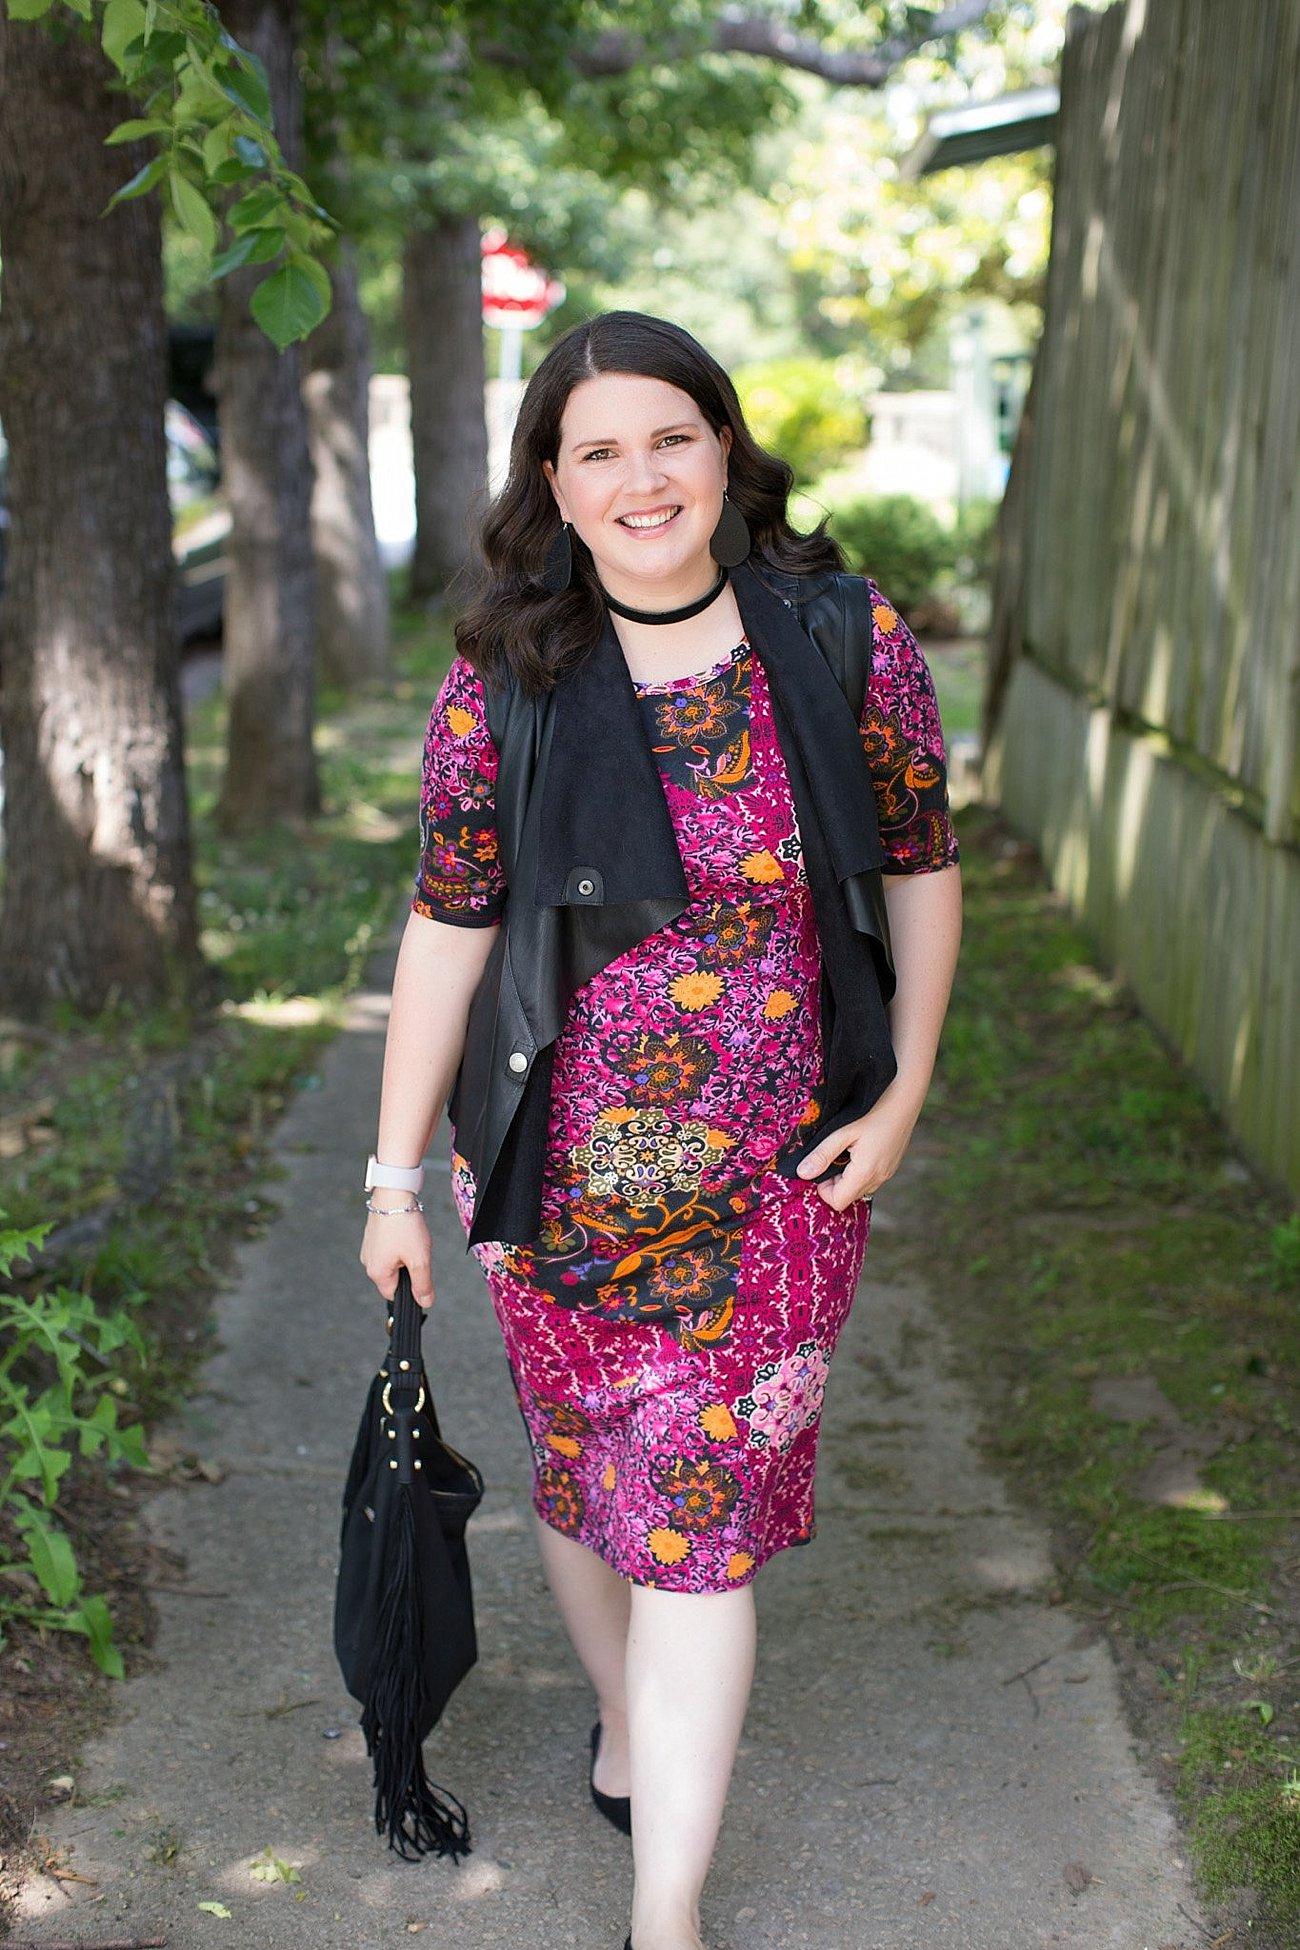 LulaRoe Julia Dress, Stitch Fix Kut From the Kloth Leather Vest, Nickel & Suede Earrings, Nickel & Suede Choker   North Carolina Fashion & Style Blogger (5)